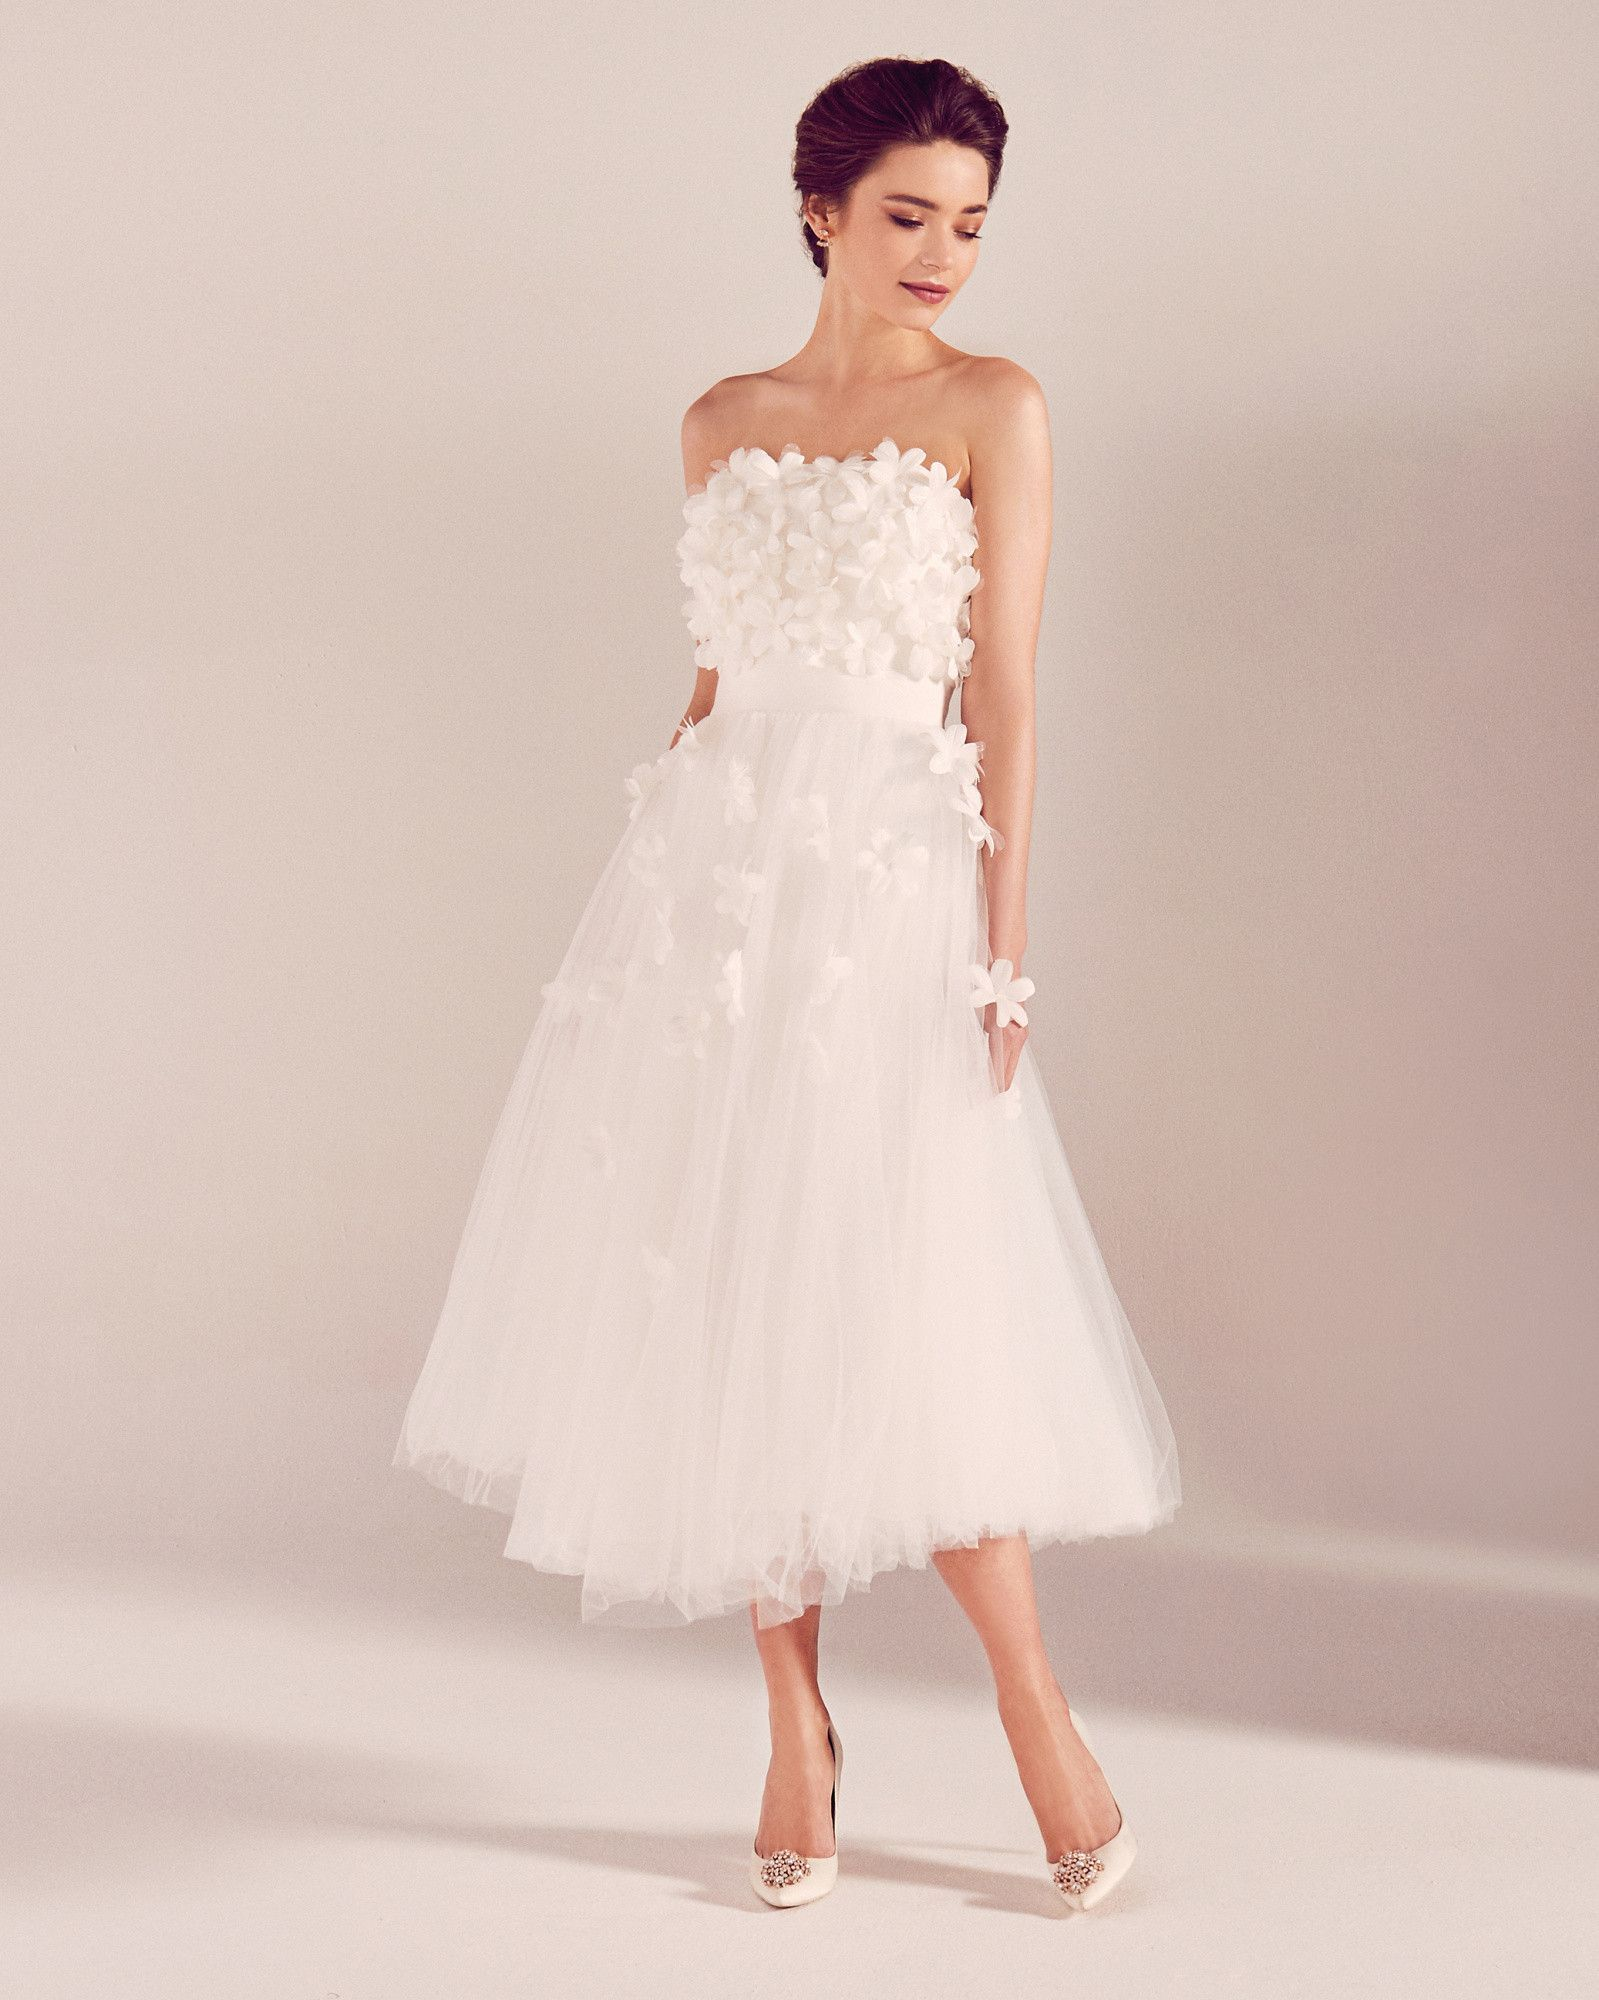 Floral appliqué tulle bridal dress - White  Wedding Dresses  Ted